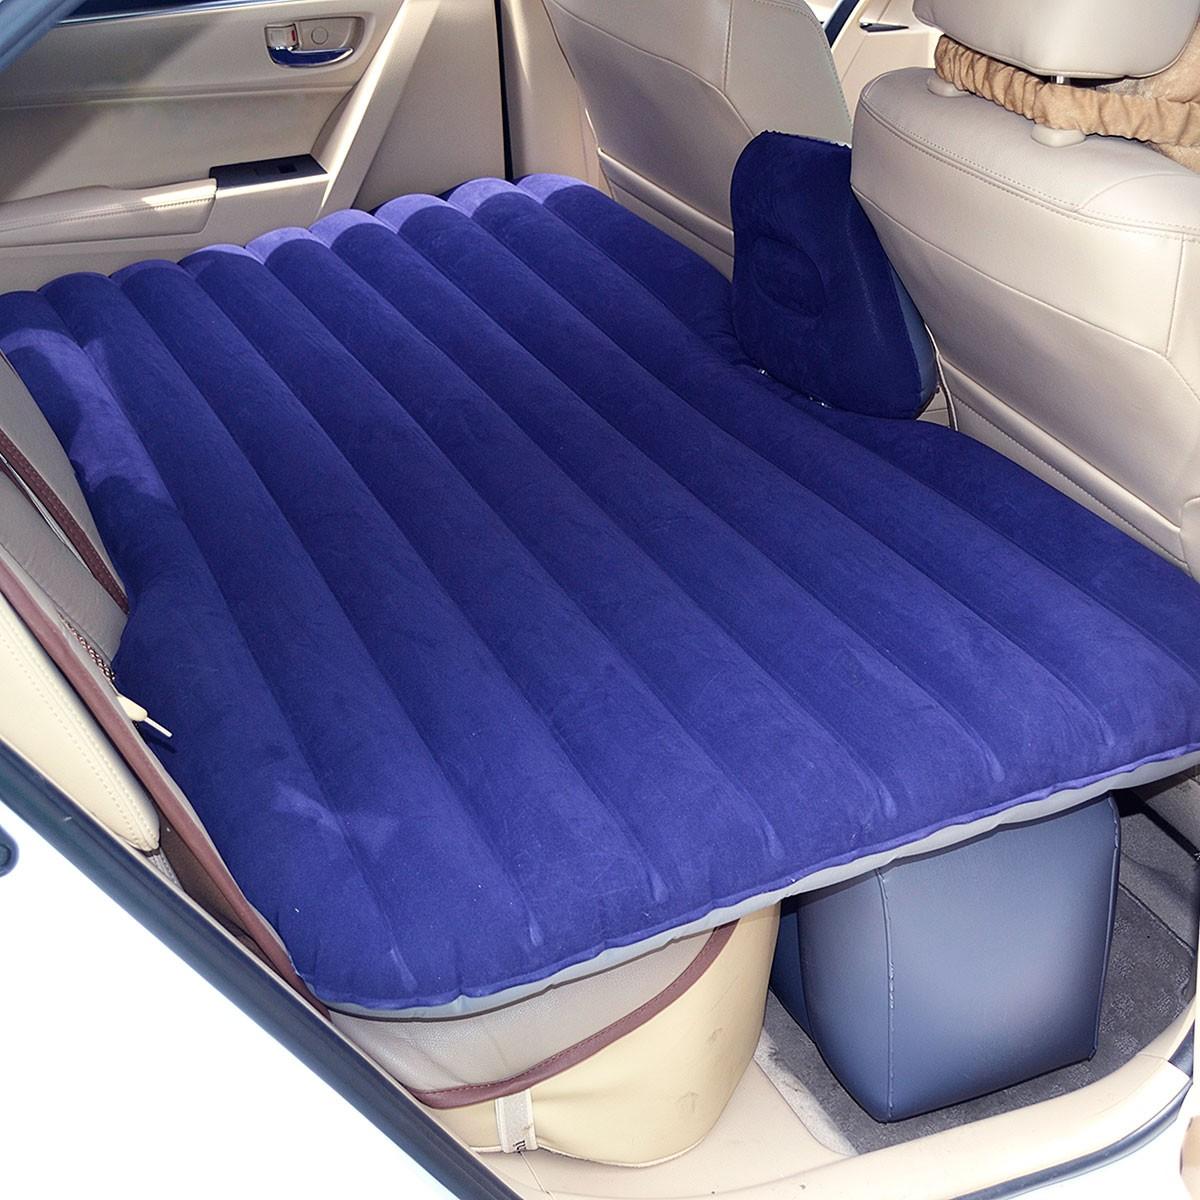 Car Travel Inflatable Mattress (DK-IB1FG)